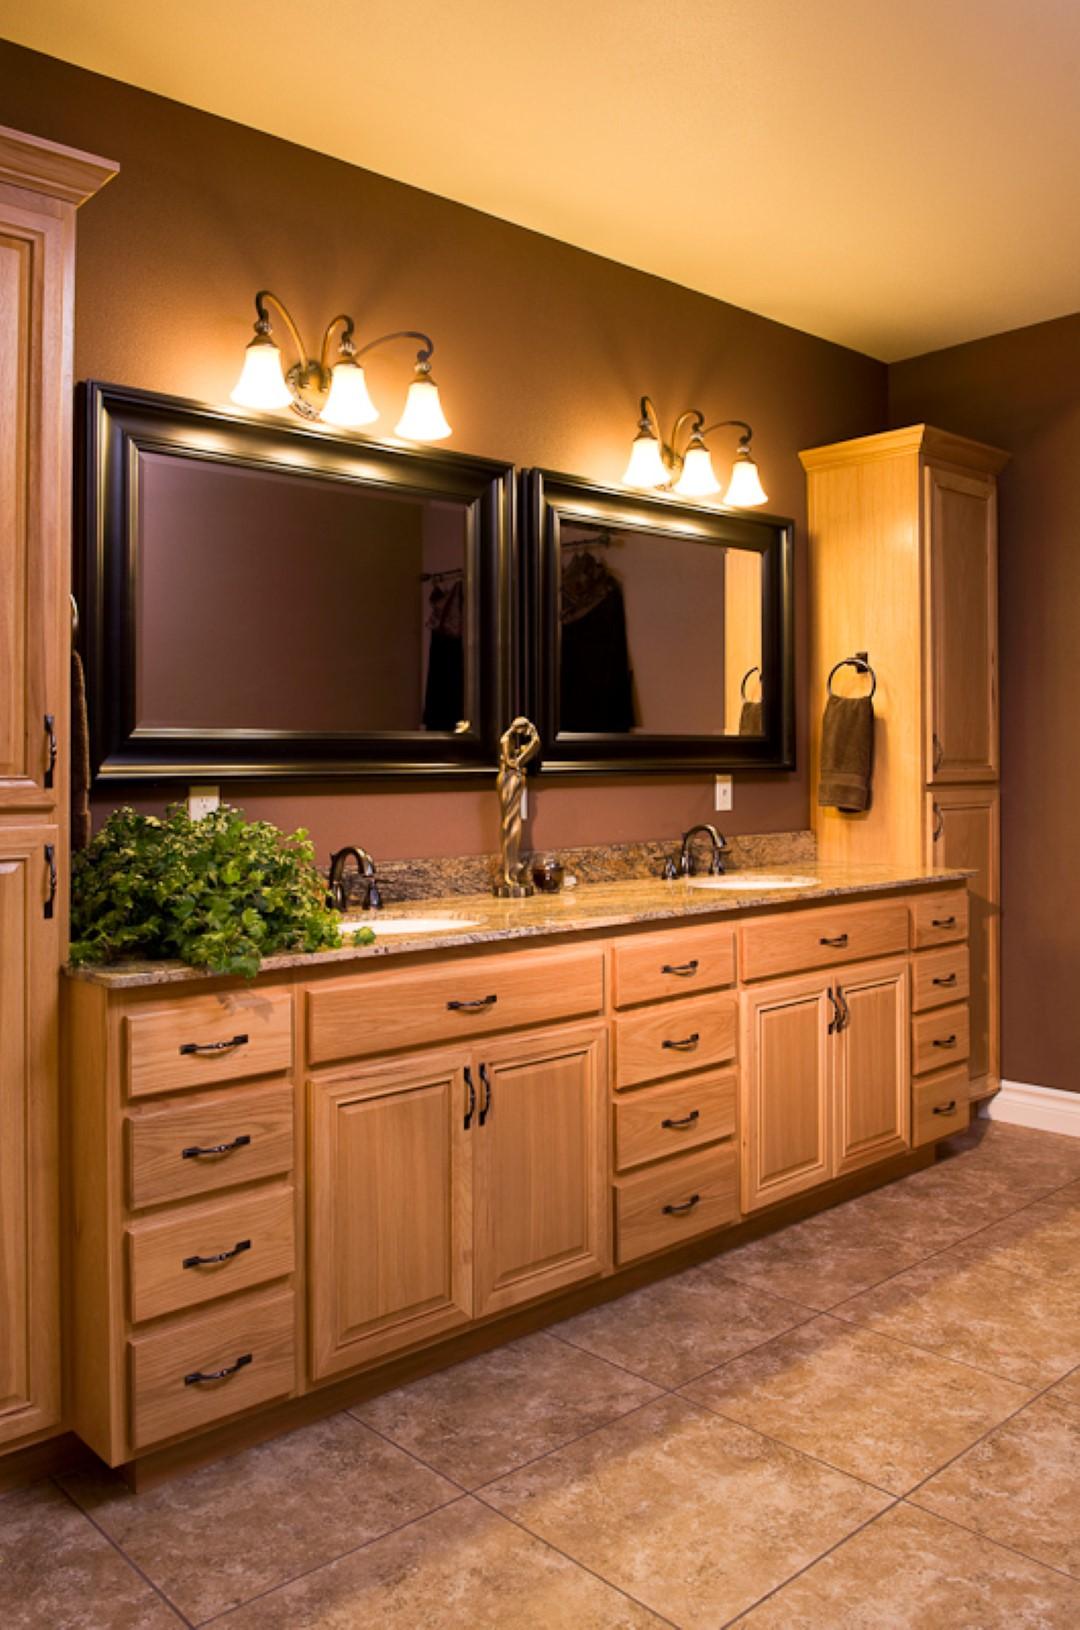 Cabinets-1016 (Large).jpg